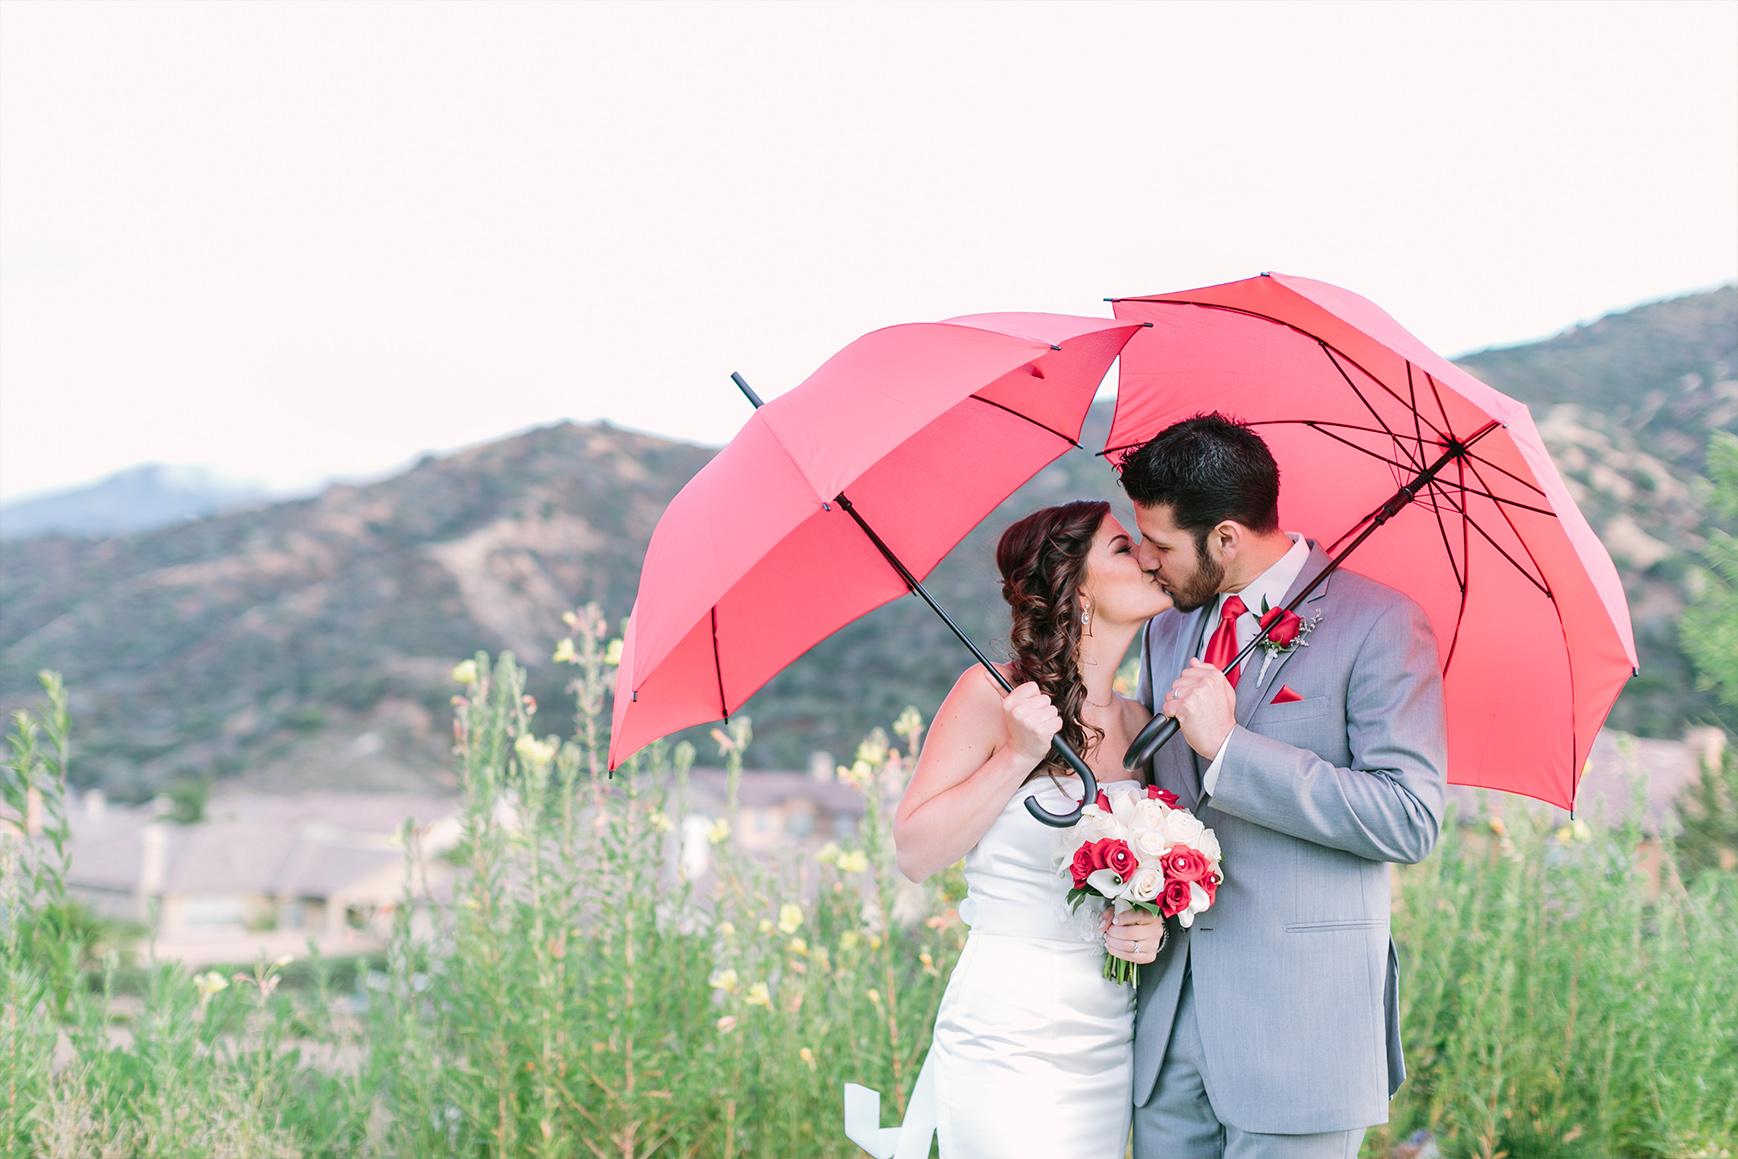 Pink umbrellas - The Retreat - Corona, California - Riverside County - Wedgewood Weddings